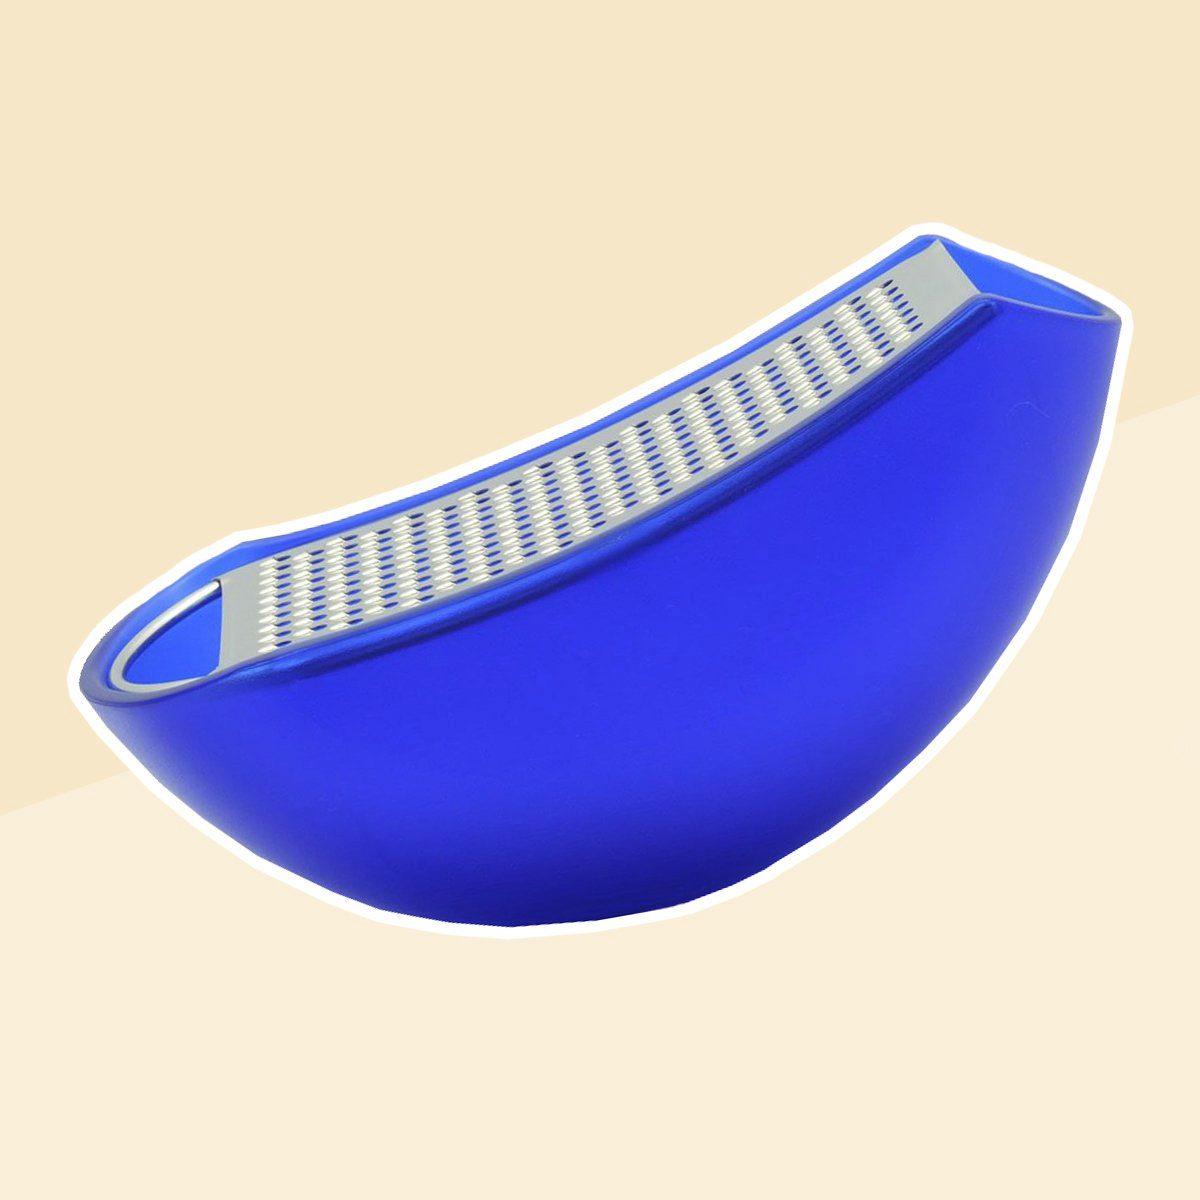 A di Alessi Parmenide Cheese Grater, Blue